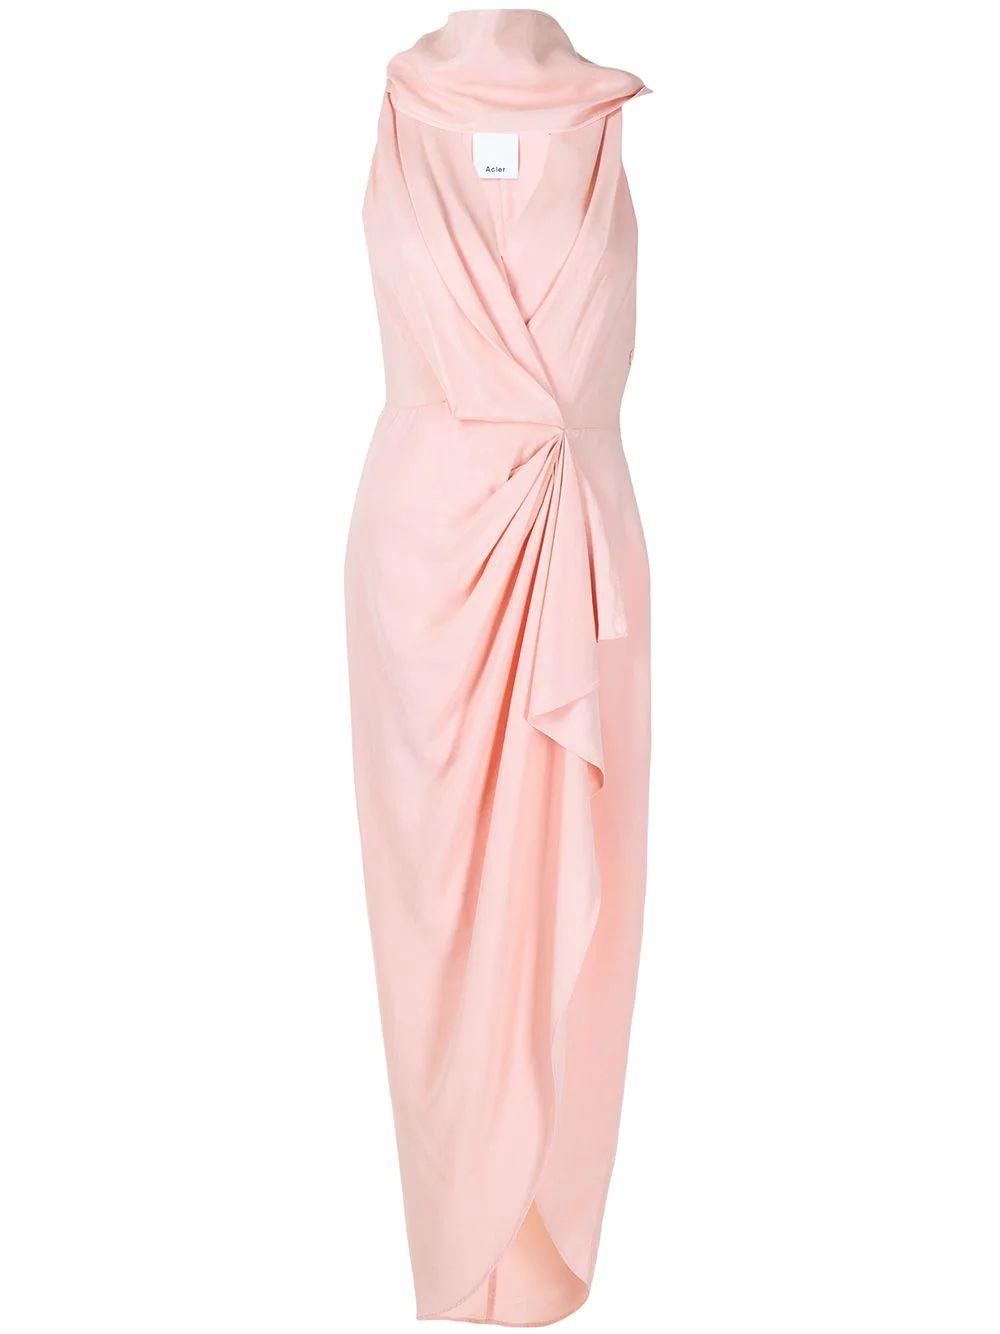 acler-daleside-vestido-midi-rosa-frunce-cintura